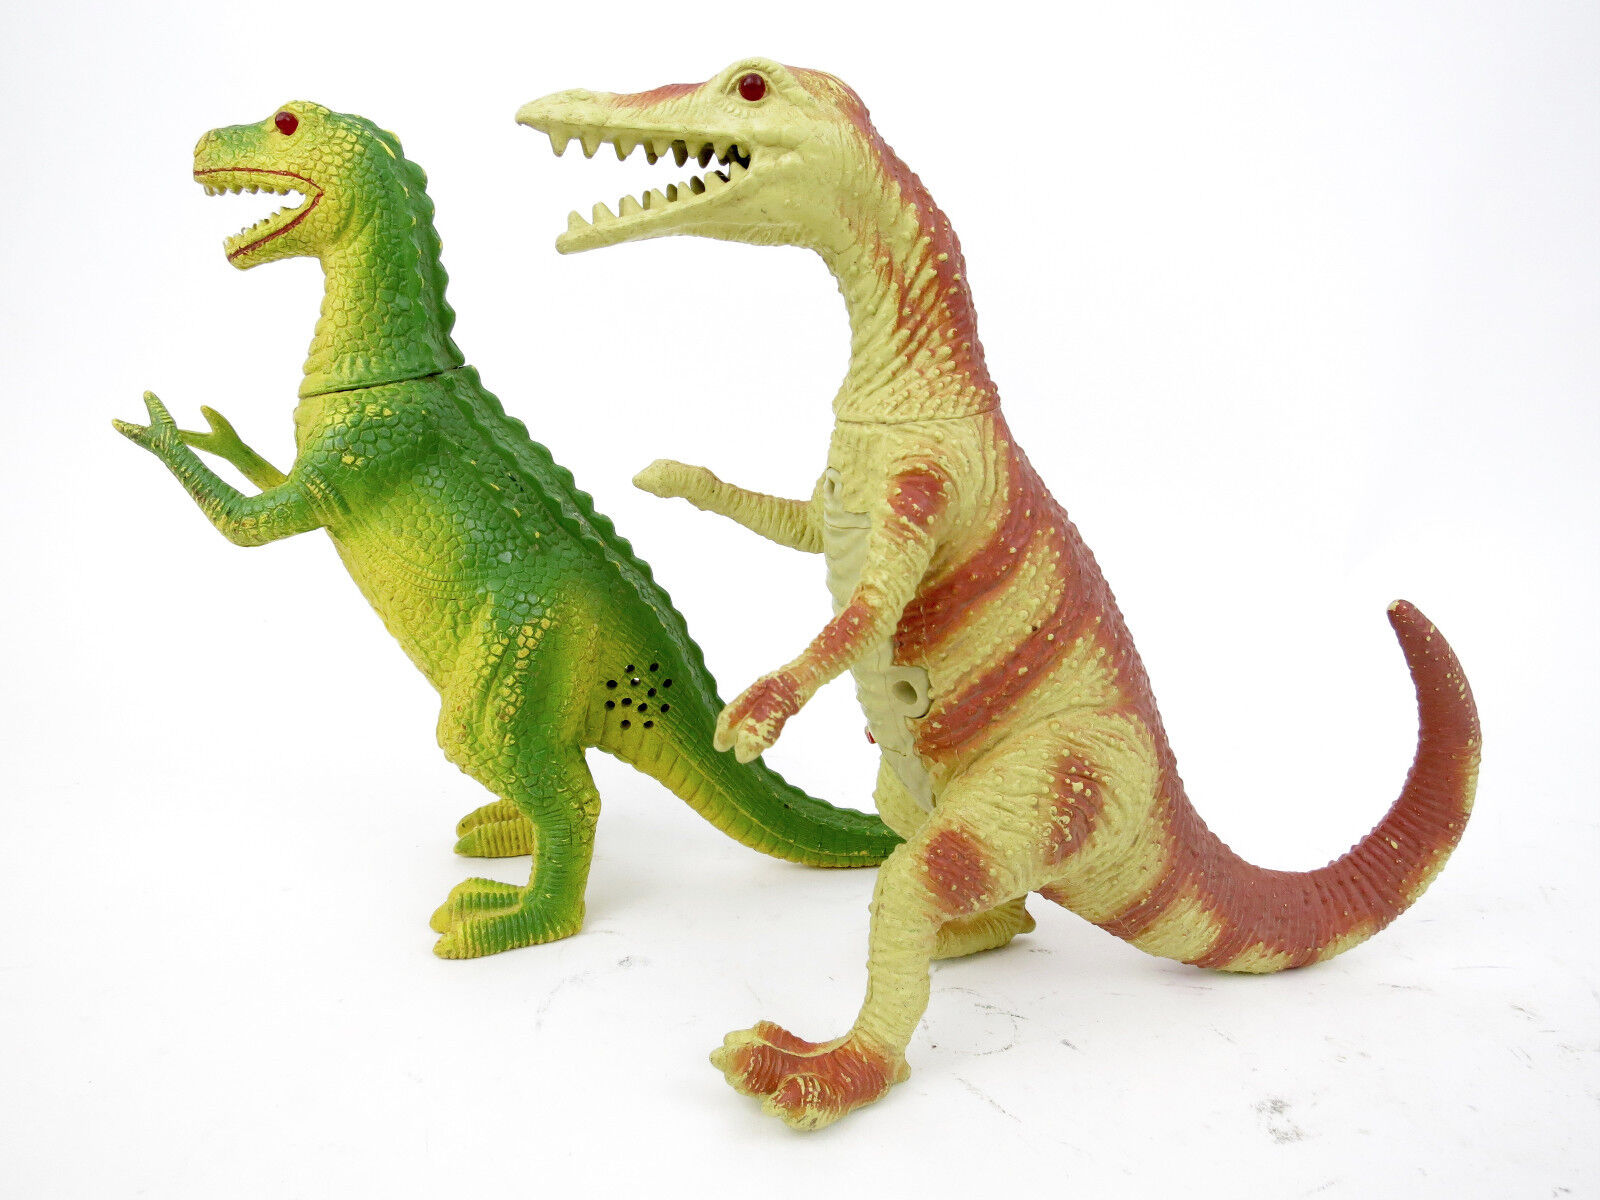 T Rex Dinosaur Toy : Vintage s imperial tyrannosaurus t rex dinosaur toy